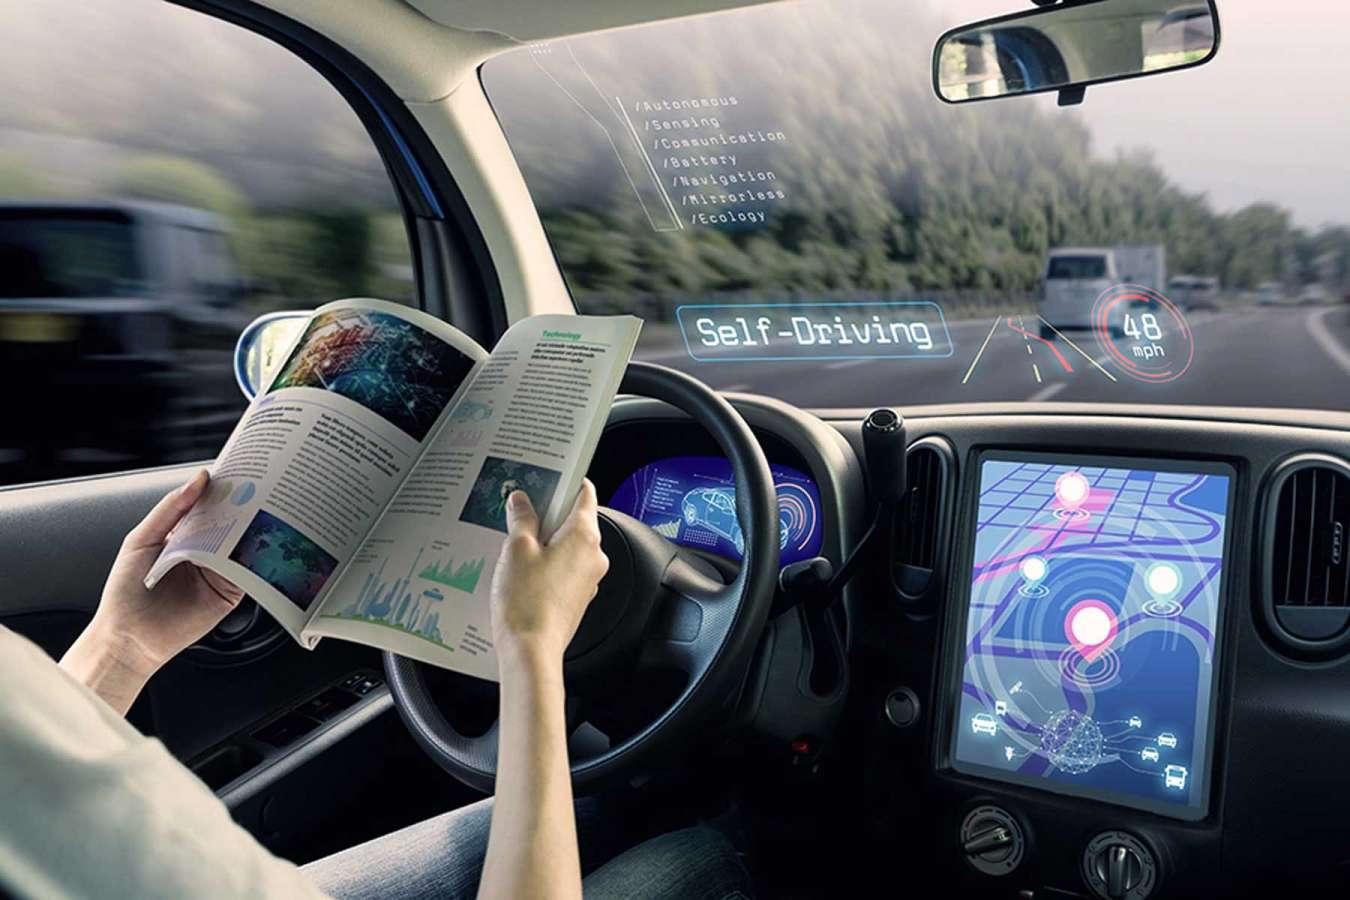 Tesla: l'Autopilot 100% autonome sera prêt d'ici 6 à 10 semaines promet Elon Musk